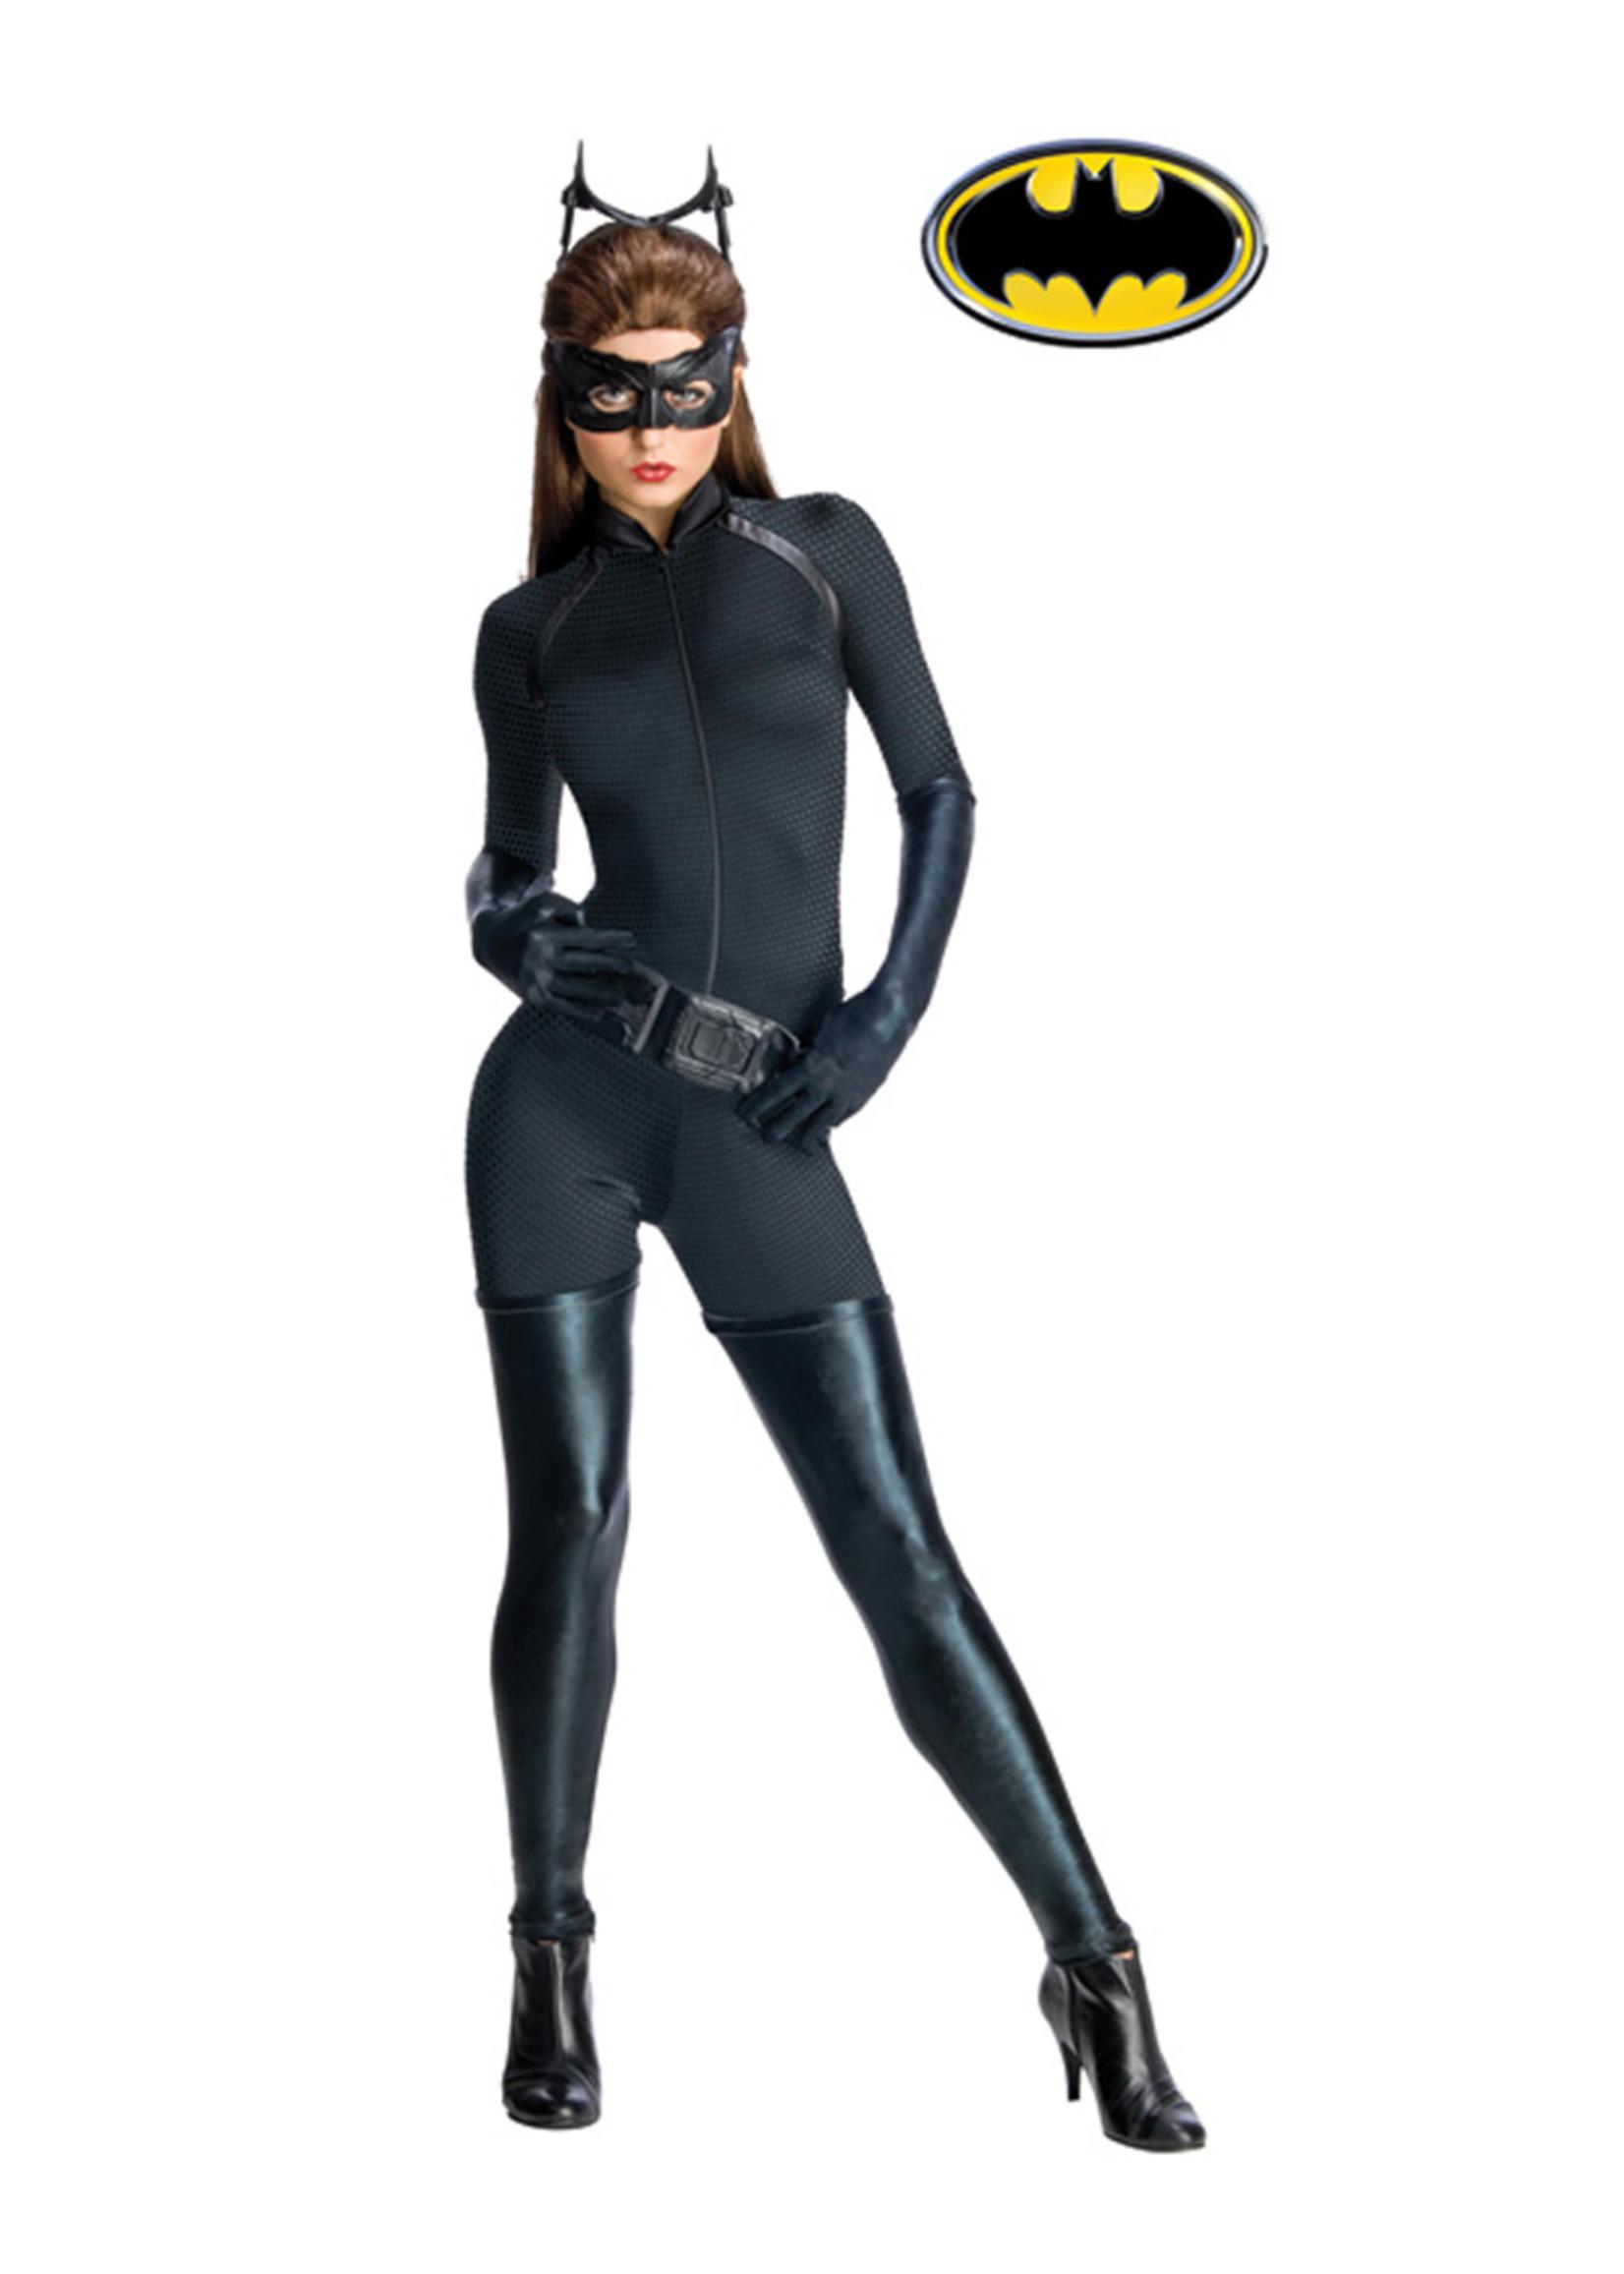 Catwoman Costume - Women's